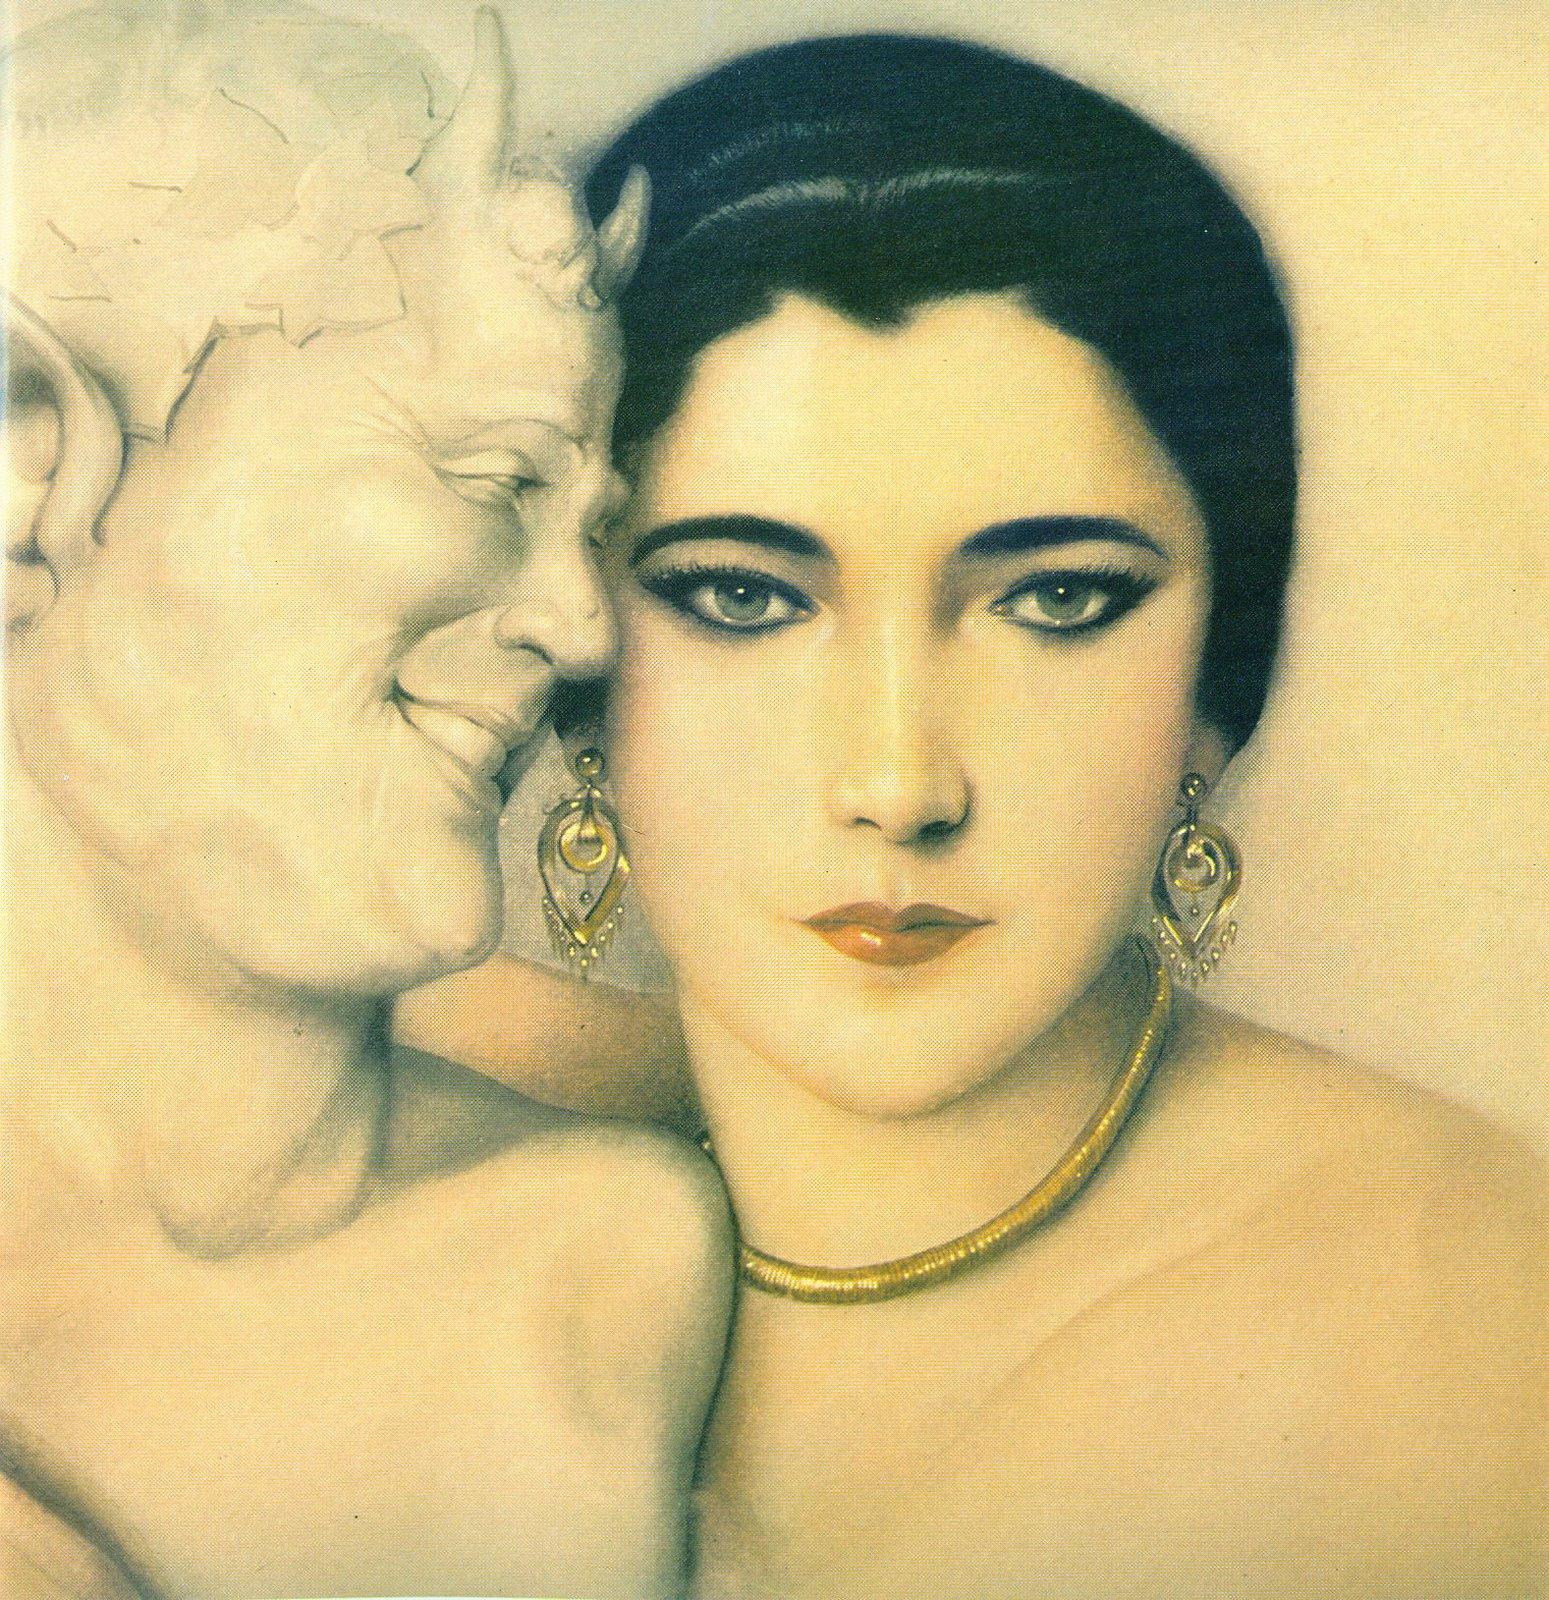 """NITA NALDI"", ΖΩΓΡΑΦΟΣ: ALBERTO VARGAS, 1923!"